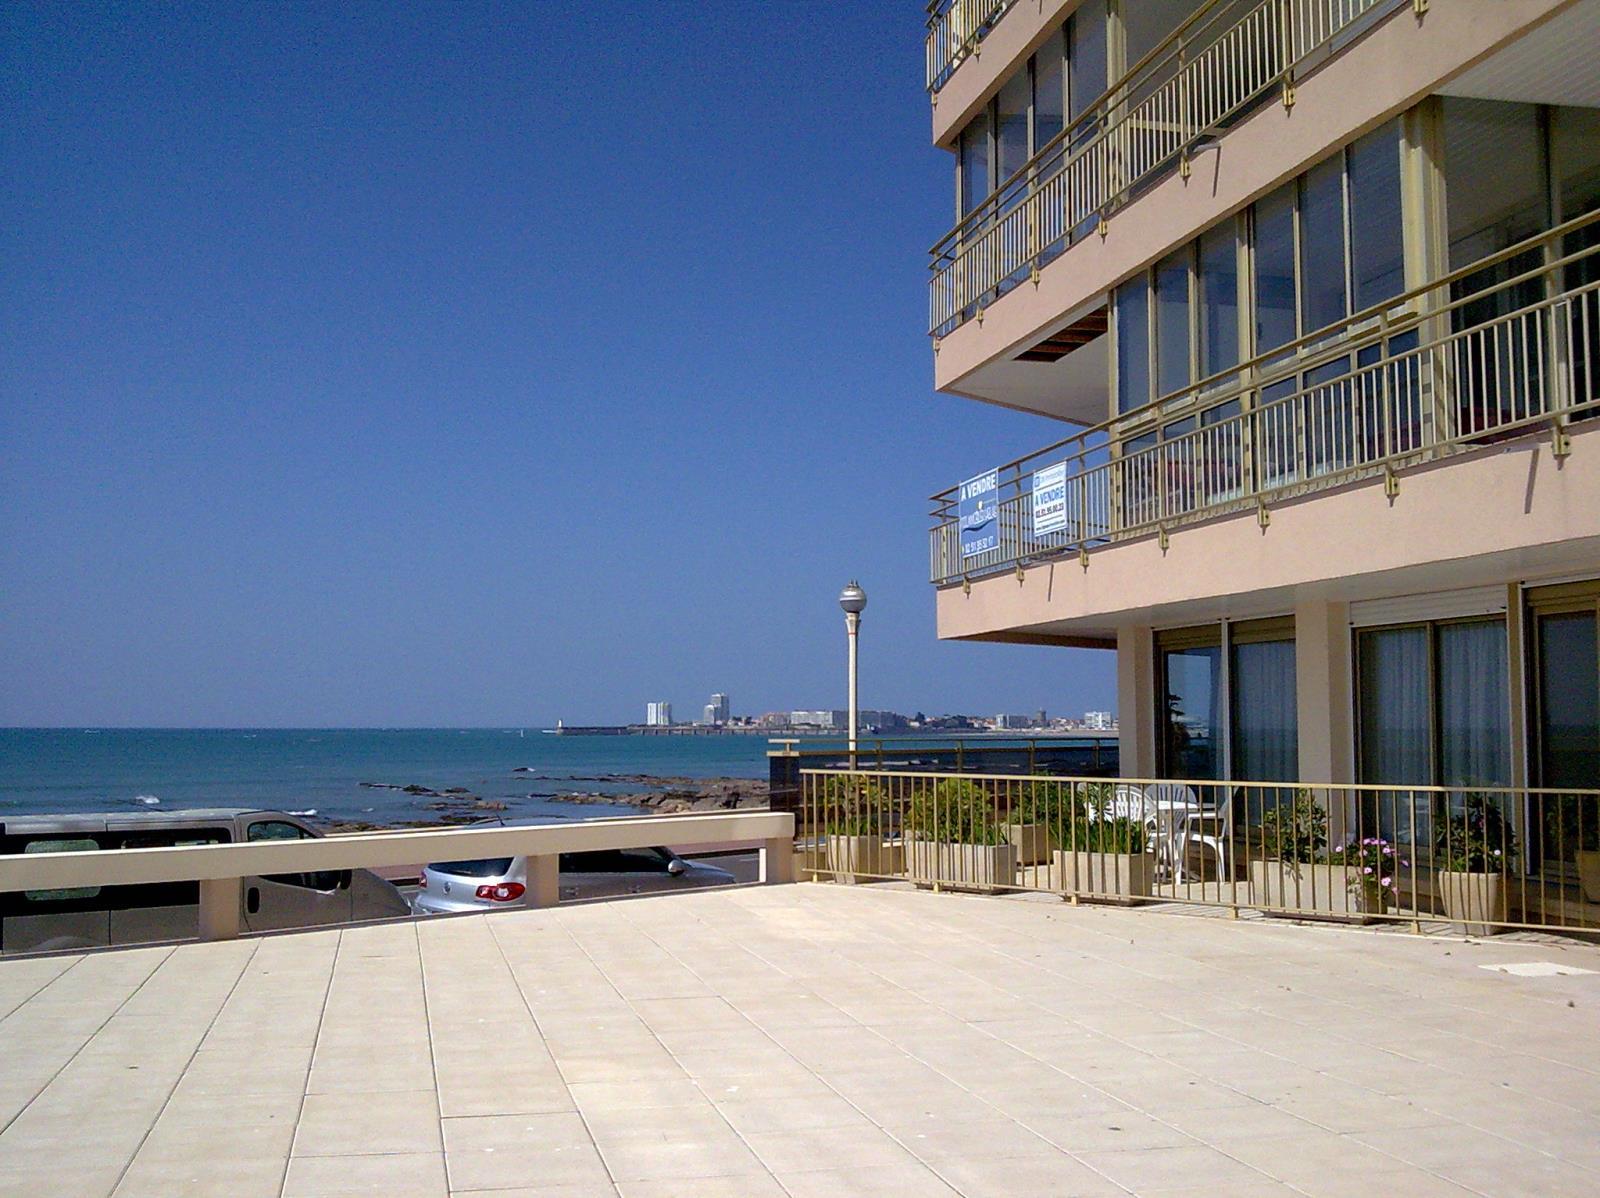 Pool immobilier sablais agence immobiliere les sables d for Agence immobiliere 85100